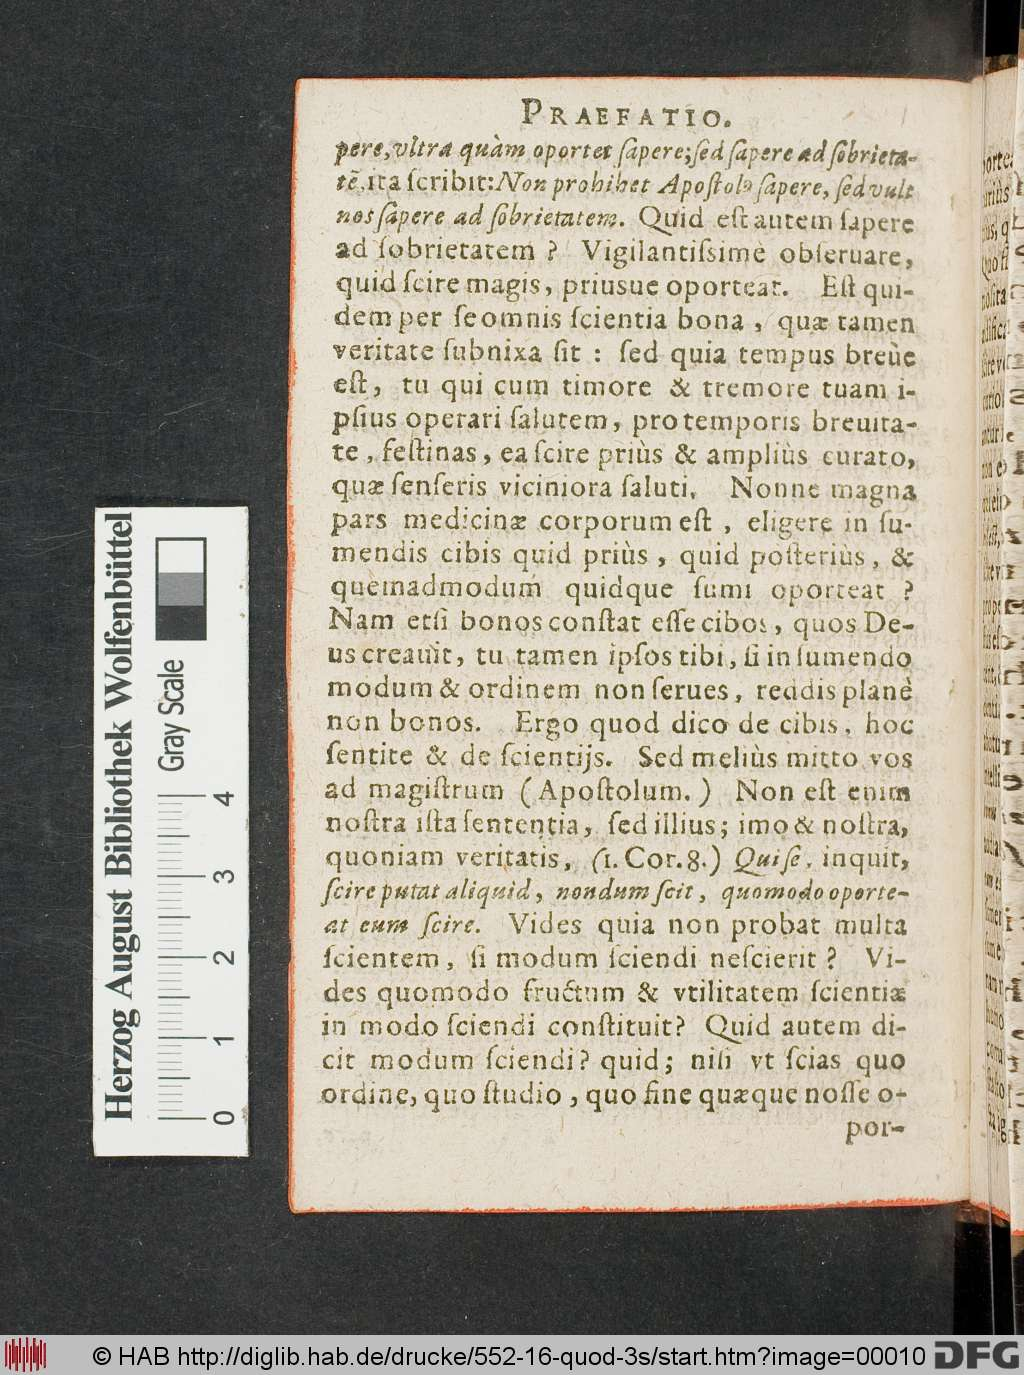 http://diglib.hab.de/drucke/552-16-quod-3s/00010.jpg